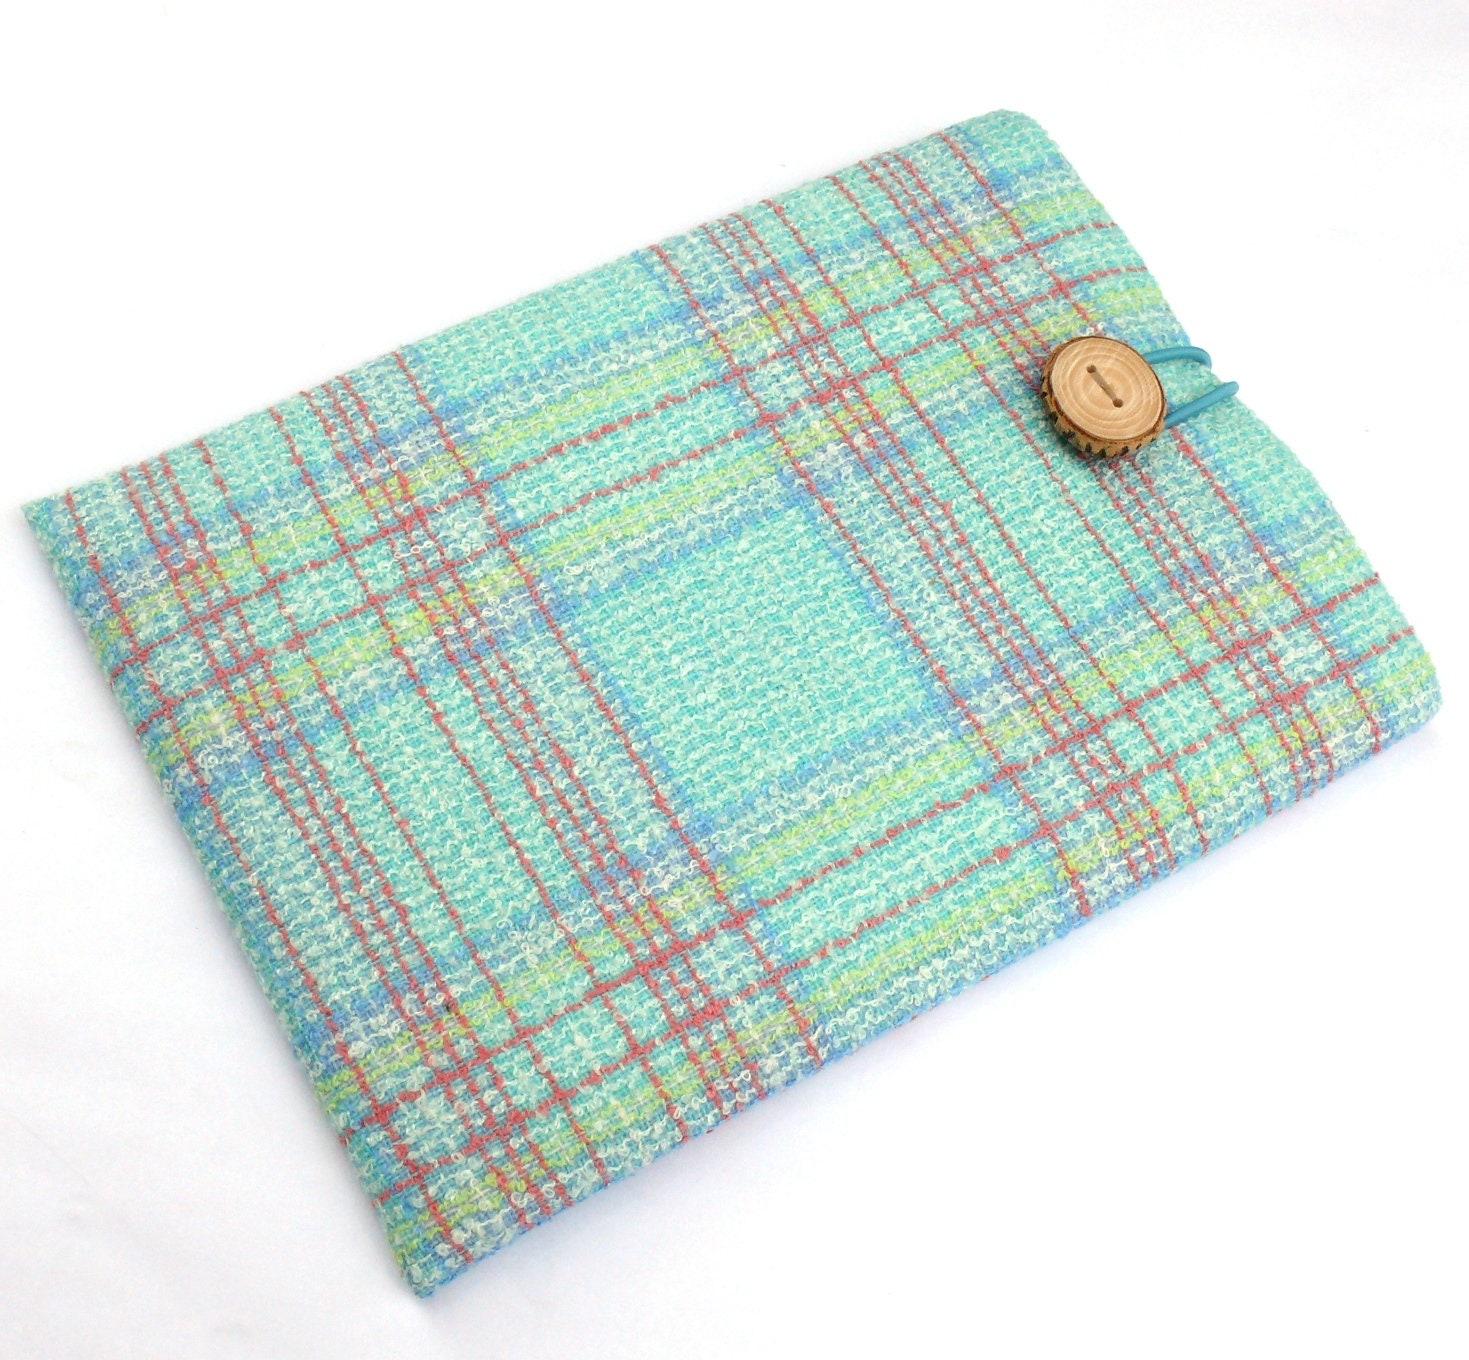 2016 MacBook Pro Case iPad 12 Case 12 MacBook Case Laptop Sleeve  SUPERIOR Shock Absorbent Foam Padding  Checked Cotton Fabric